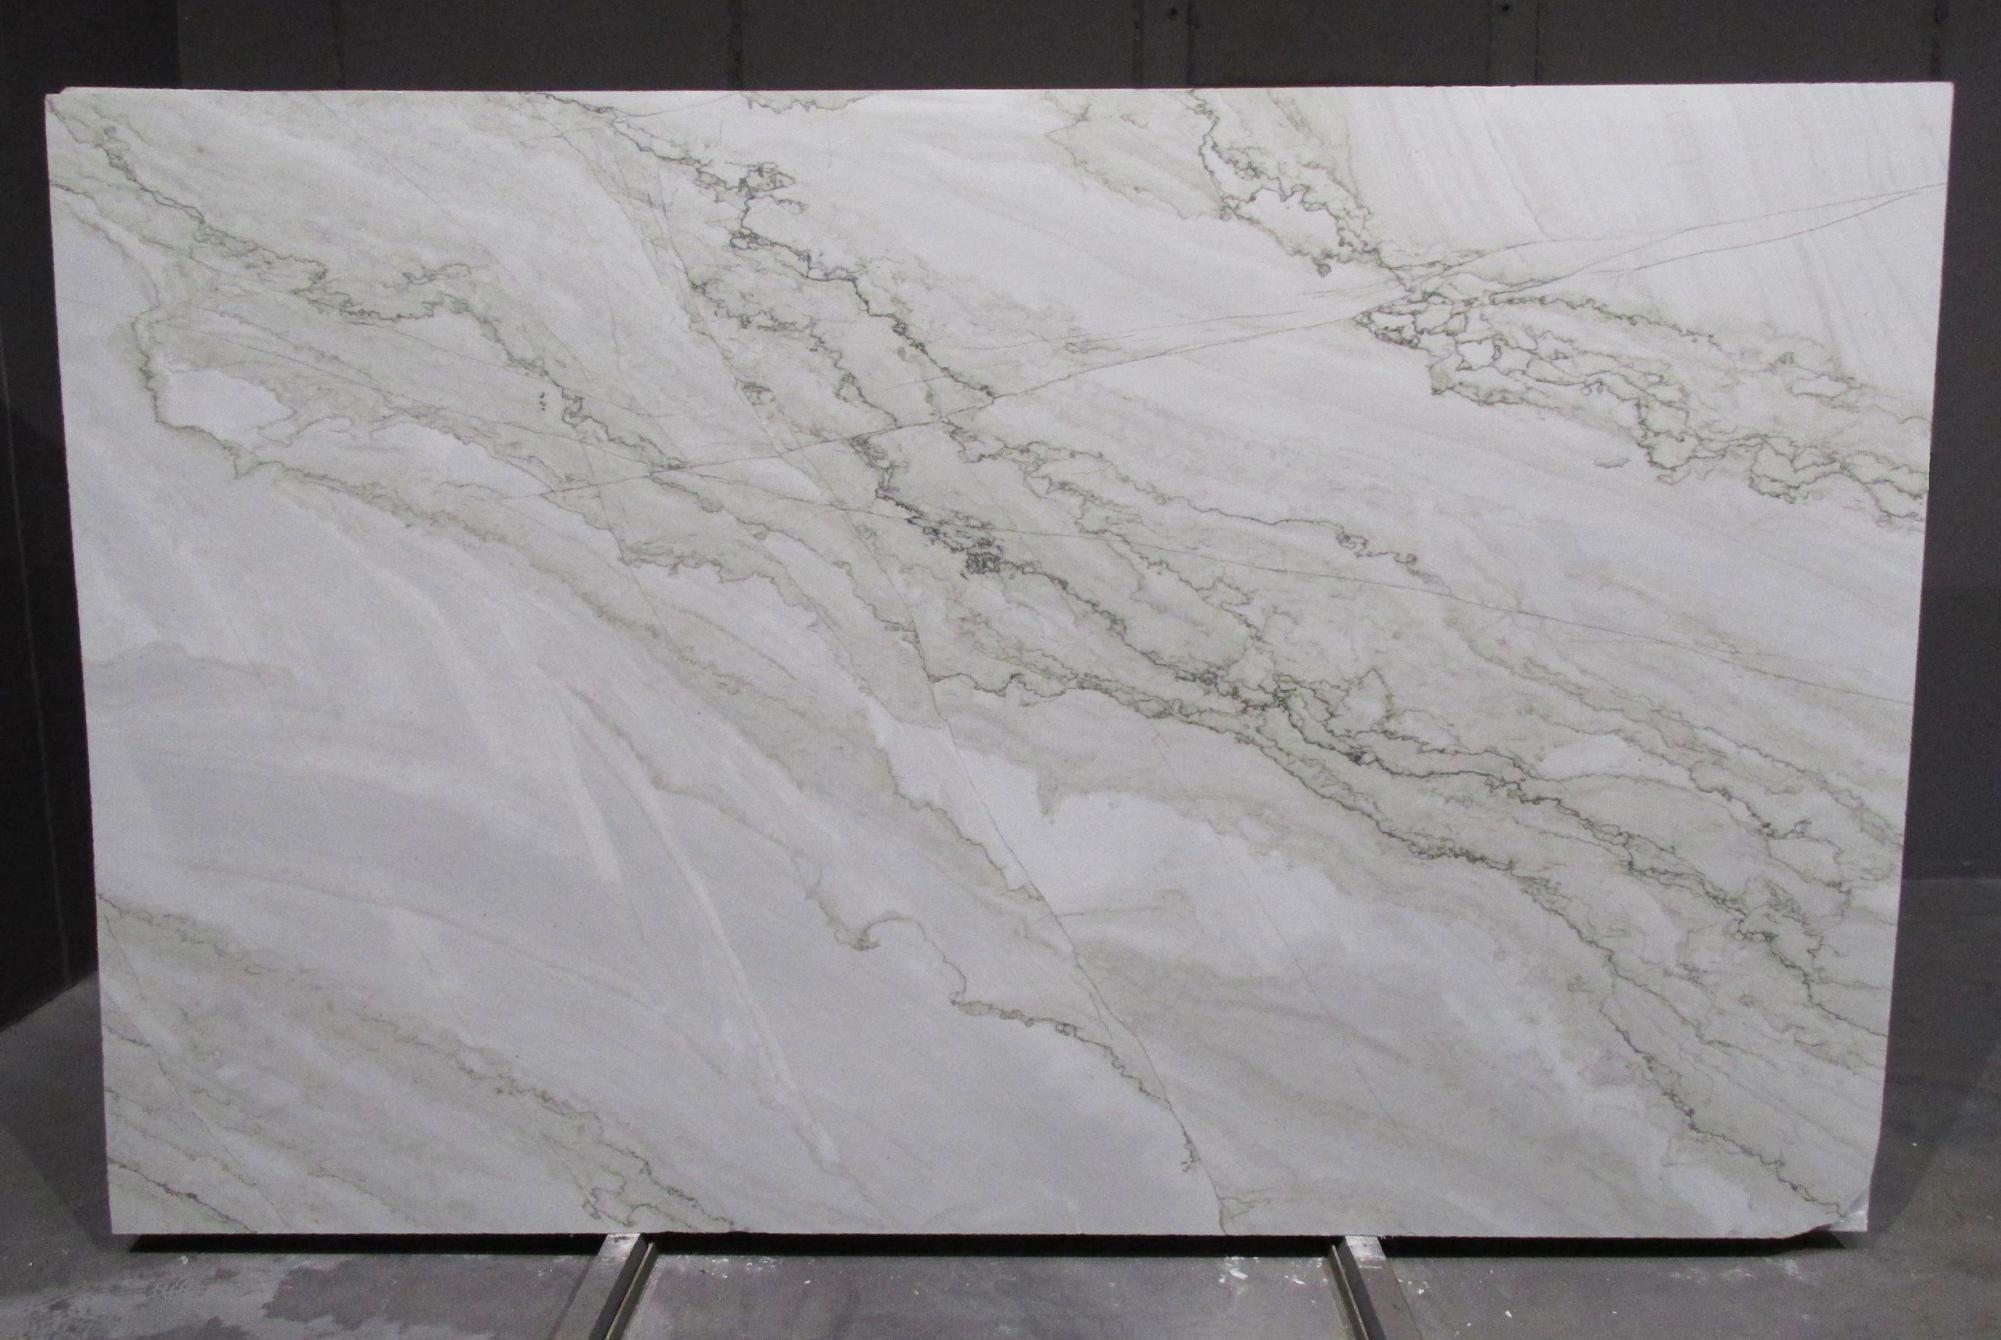 SUPREME PEARL Supply Veneto (Italy) polished slabs 1492G , Bnds 3cm natural quartzite